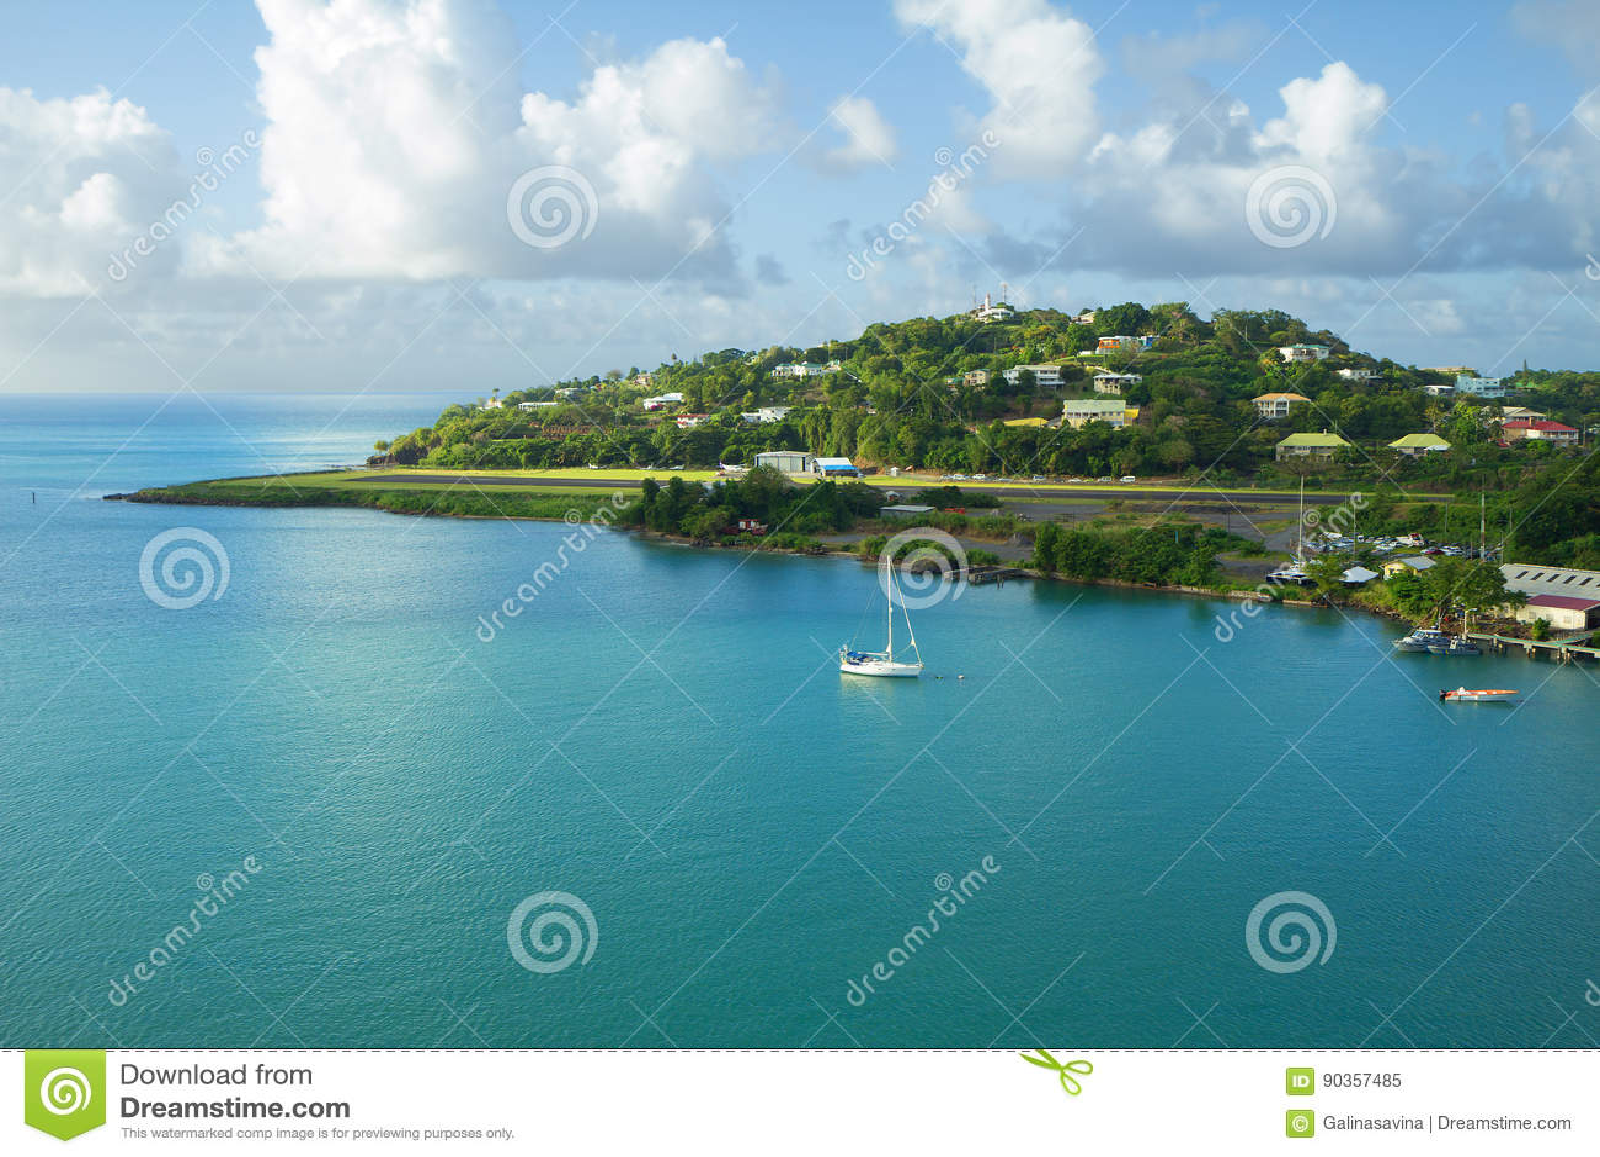 Landing strip island